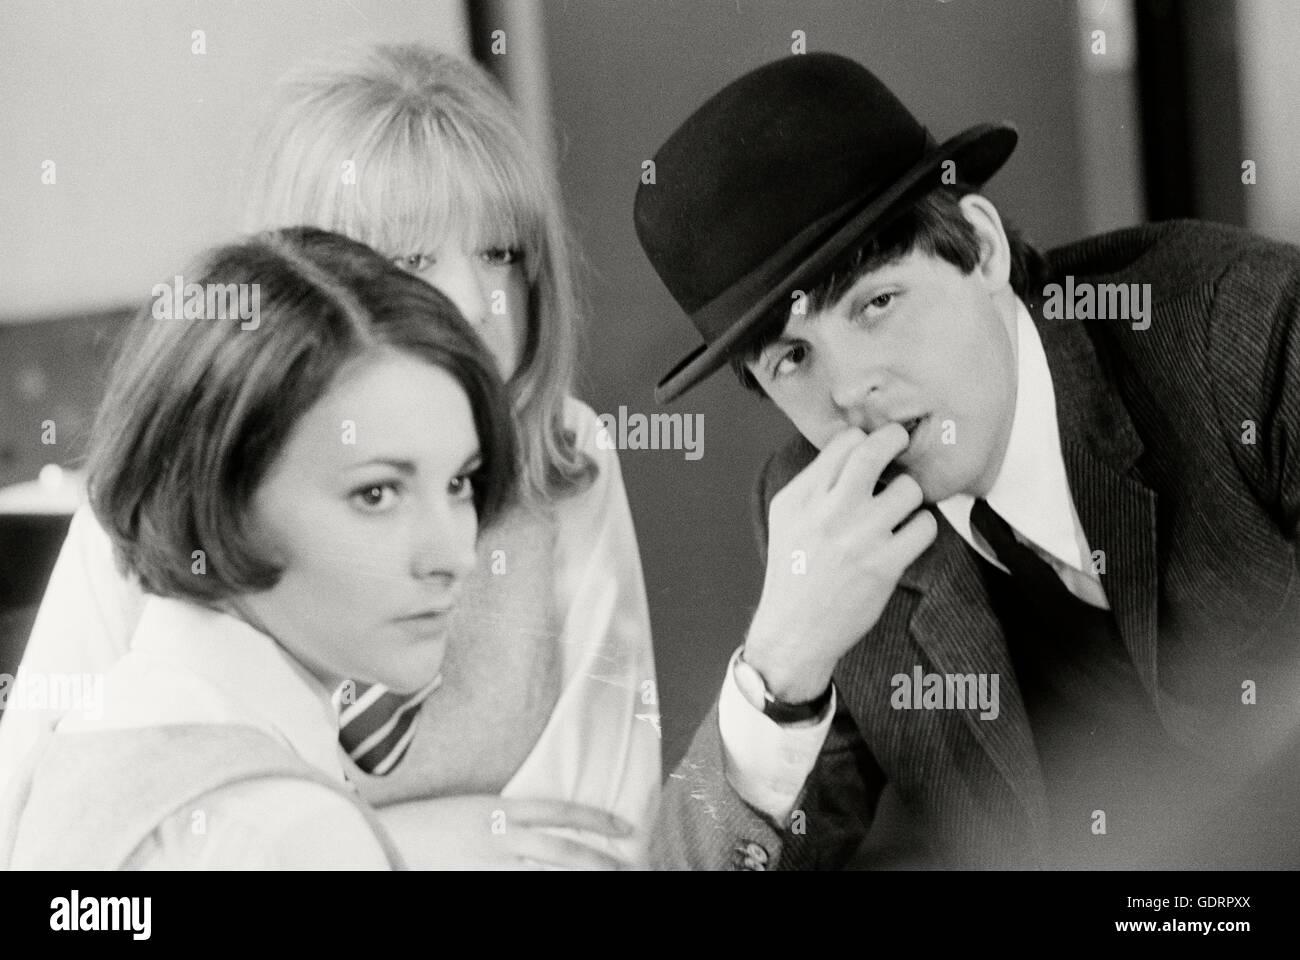 Paul McCartney with Prudence Bury and Pattie Boyd playing school girls on a Hard Days Night Train. - Stock Image